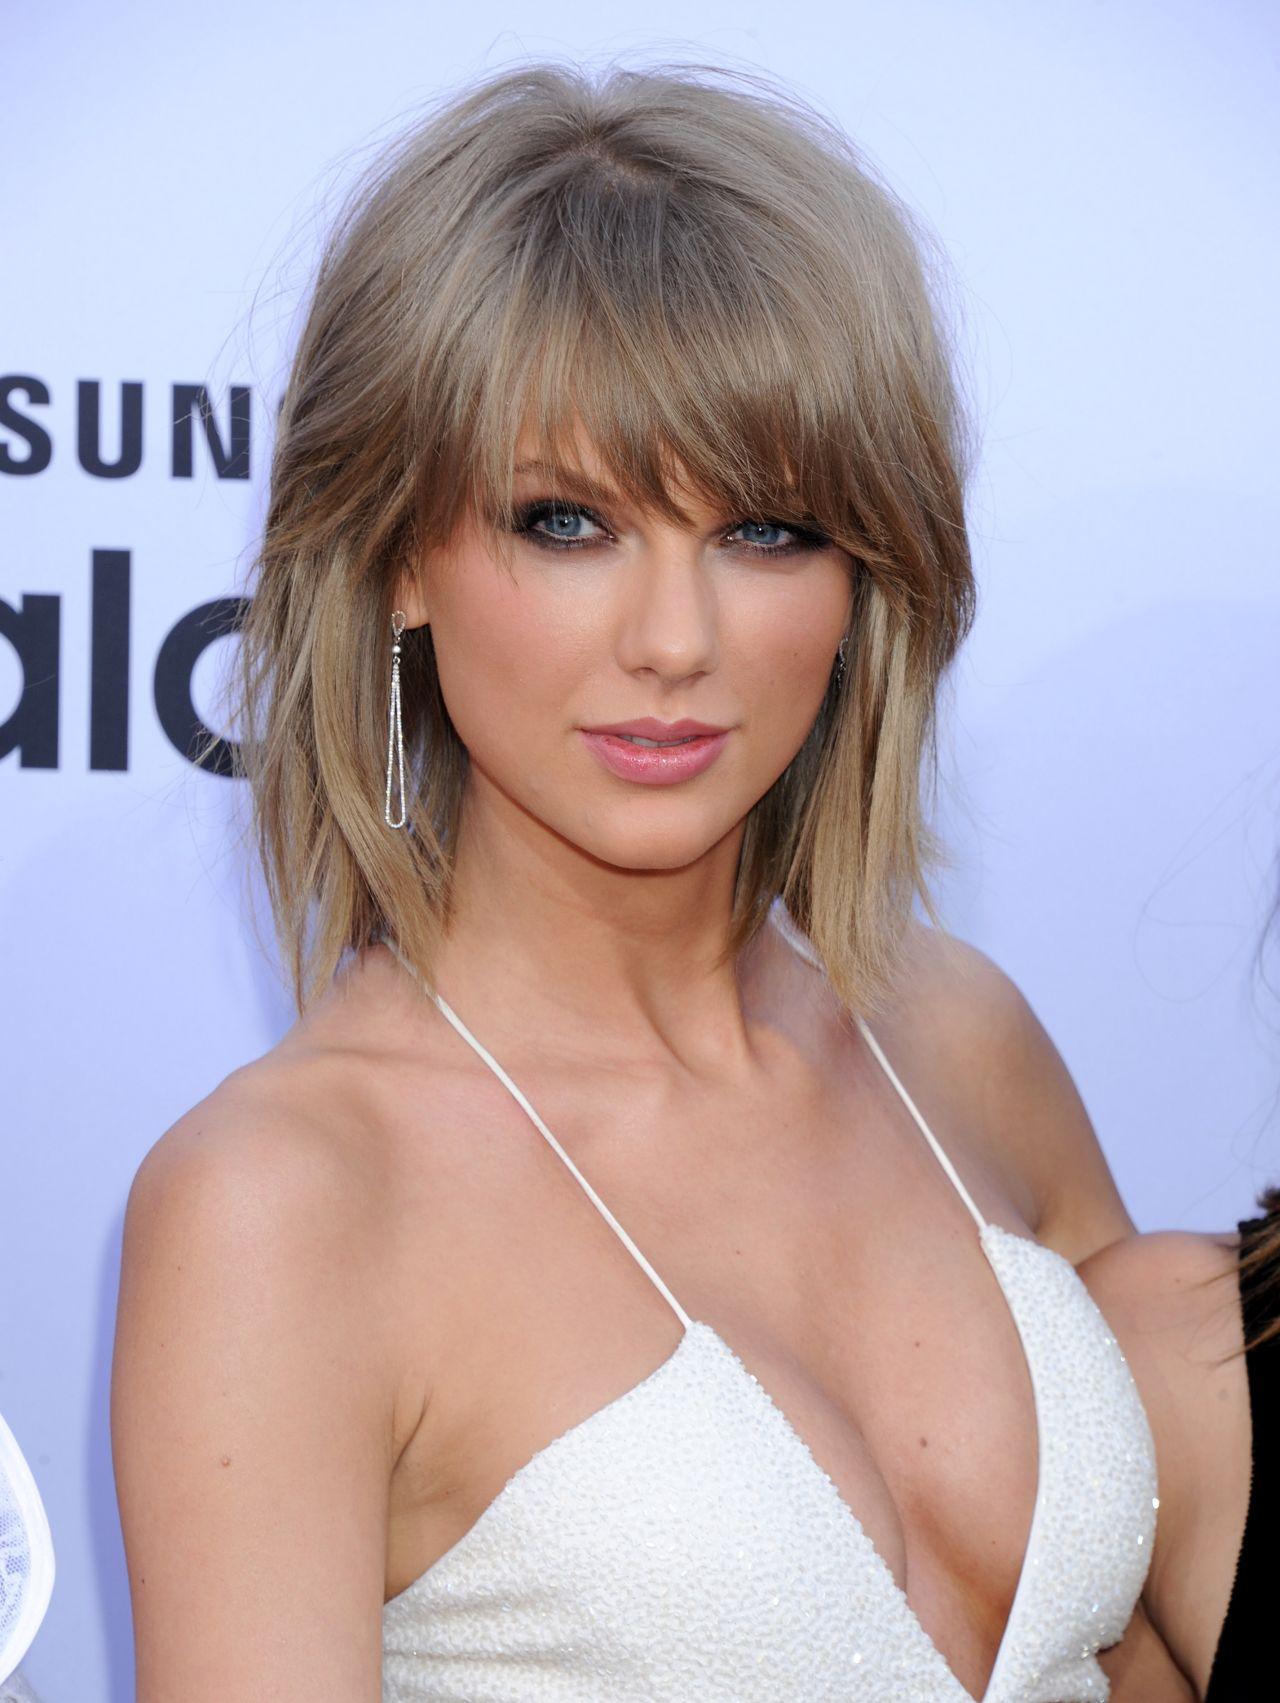 Taylor Swift Brinco Longo